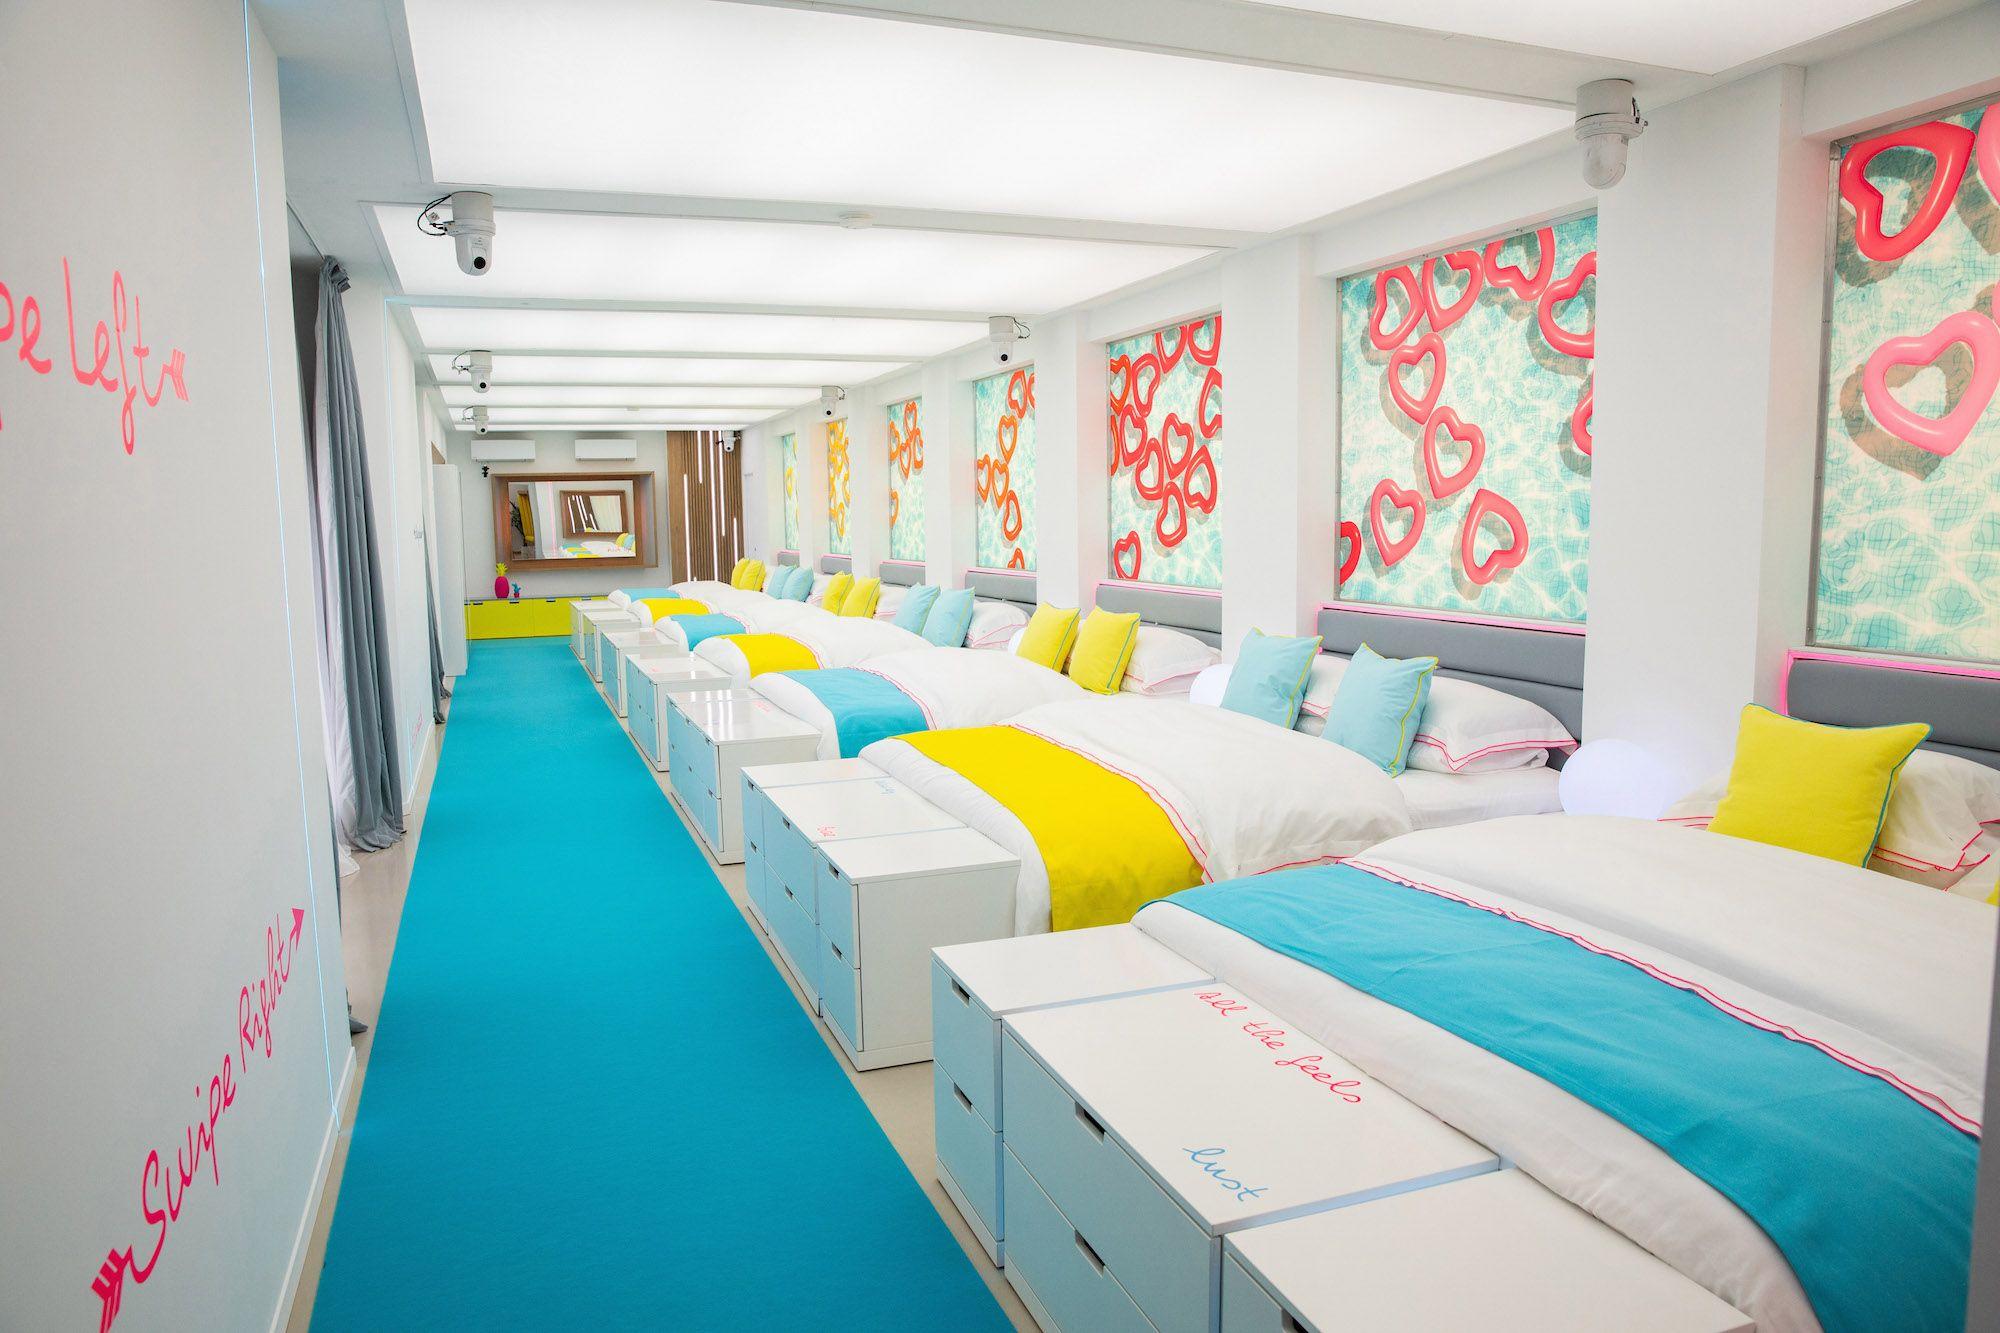 Image may contain: Love Island villa, Love Island, 2019, location, Sant Llorenç des Cardassar, Desk, Table, Interior Design, Dorm Room, Bed, Furniture, Bedroom, Indoors, Room